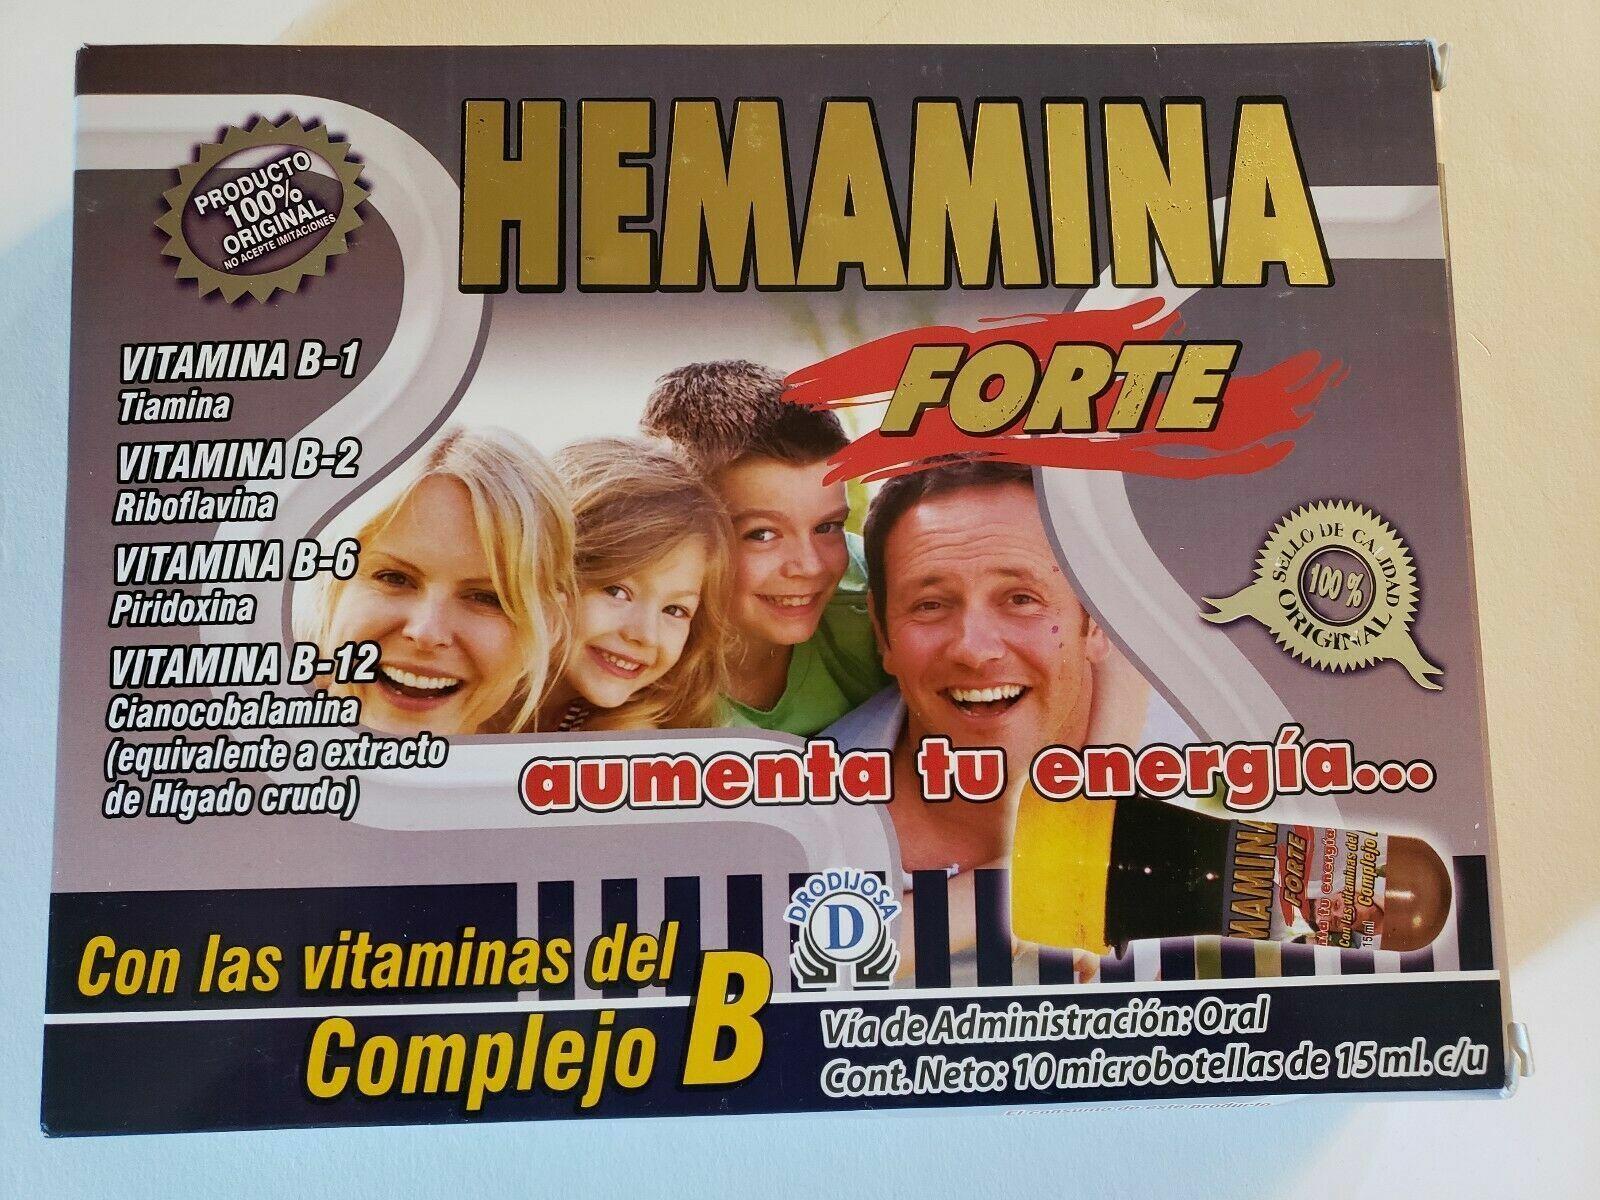 HEMAMINA FORTE ENERGY BOOSTER/ COMPLEJO B ENERGIZANTE EN MICROBOTELLAS 10